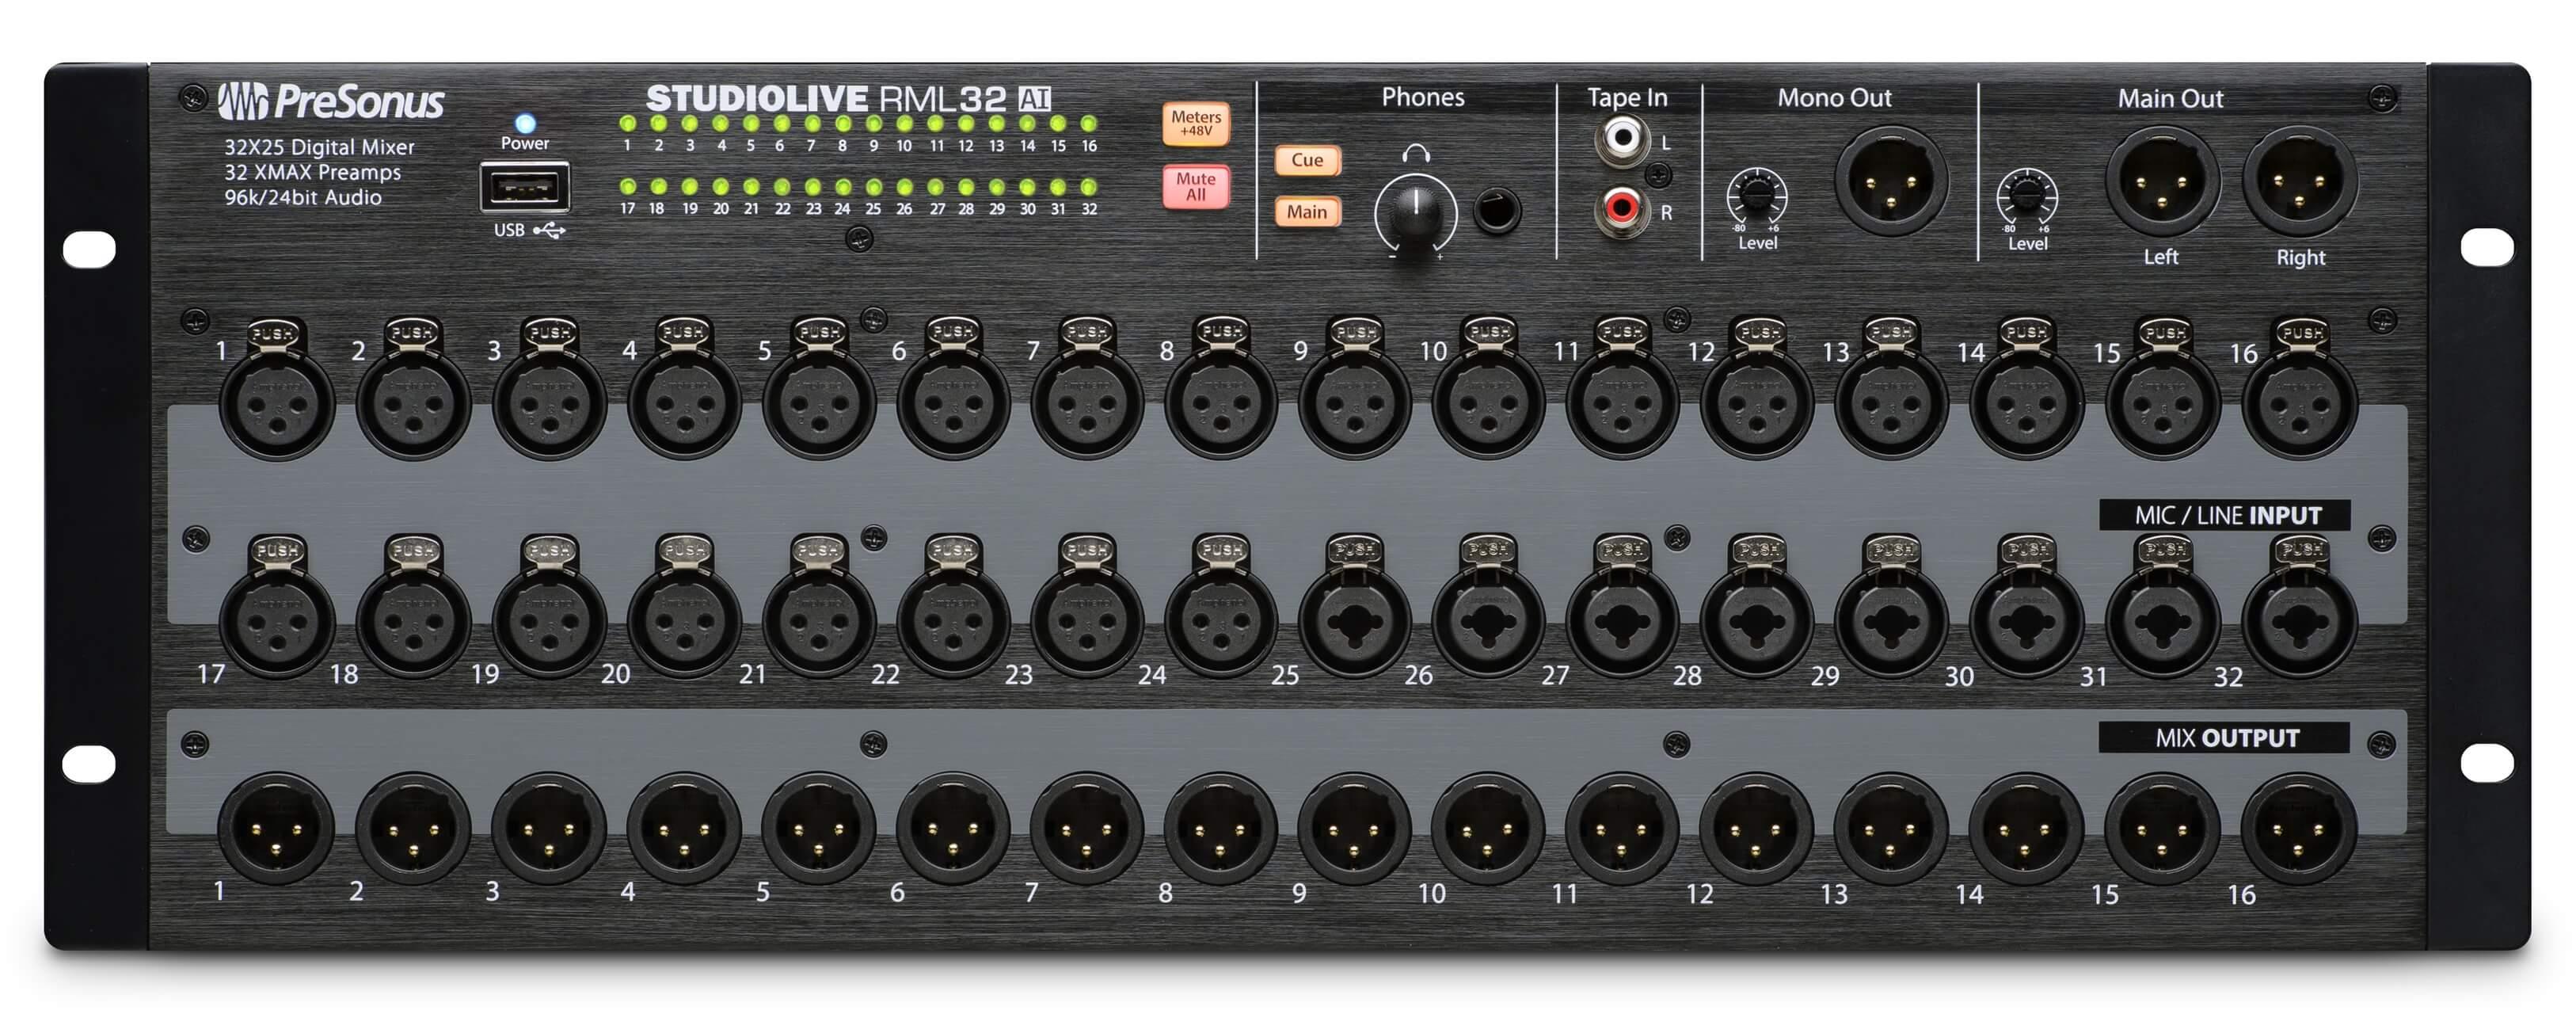 Presonus Studiolive Rml16ai Rml32ai Mixers Shipping